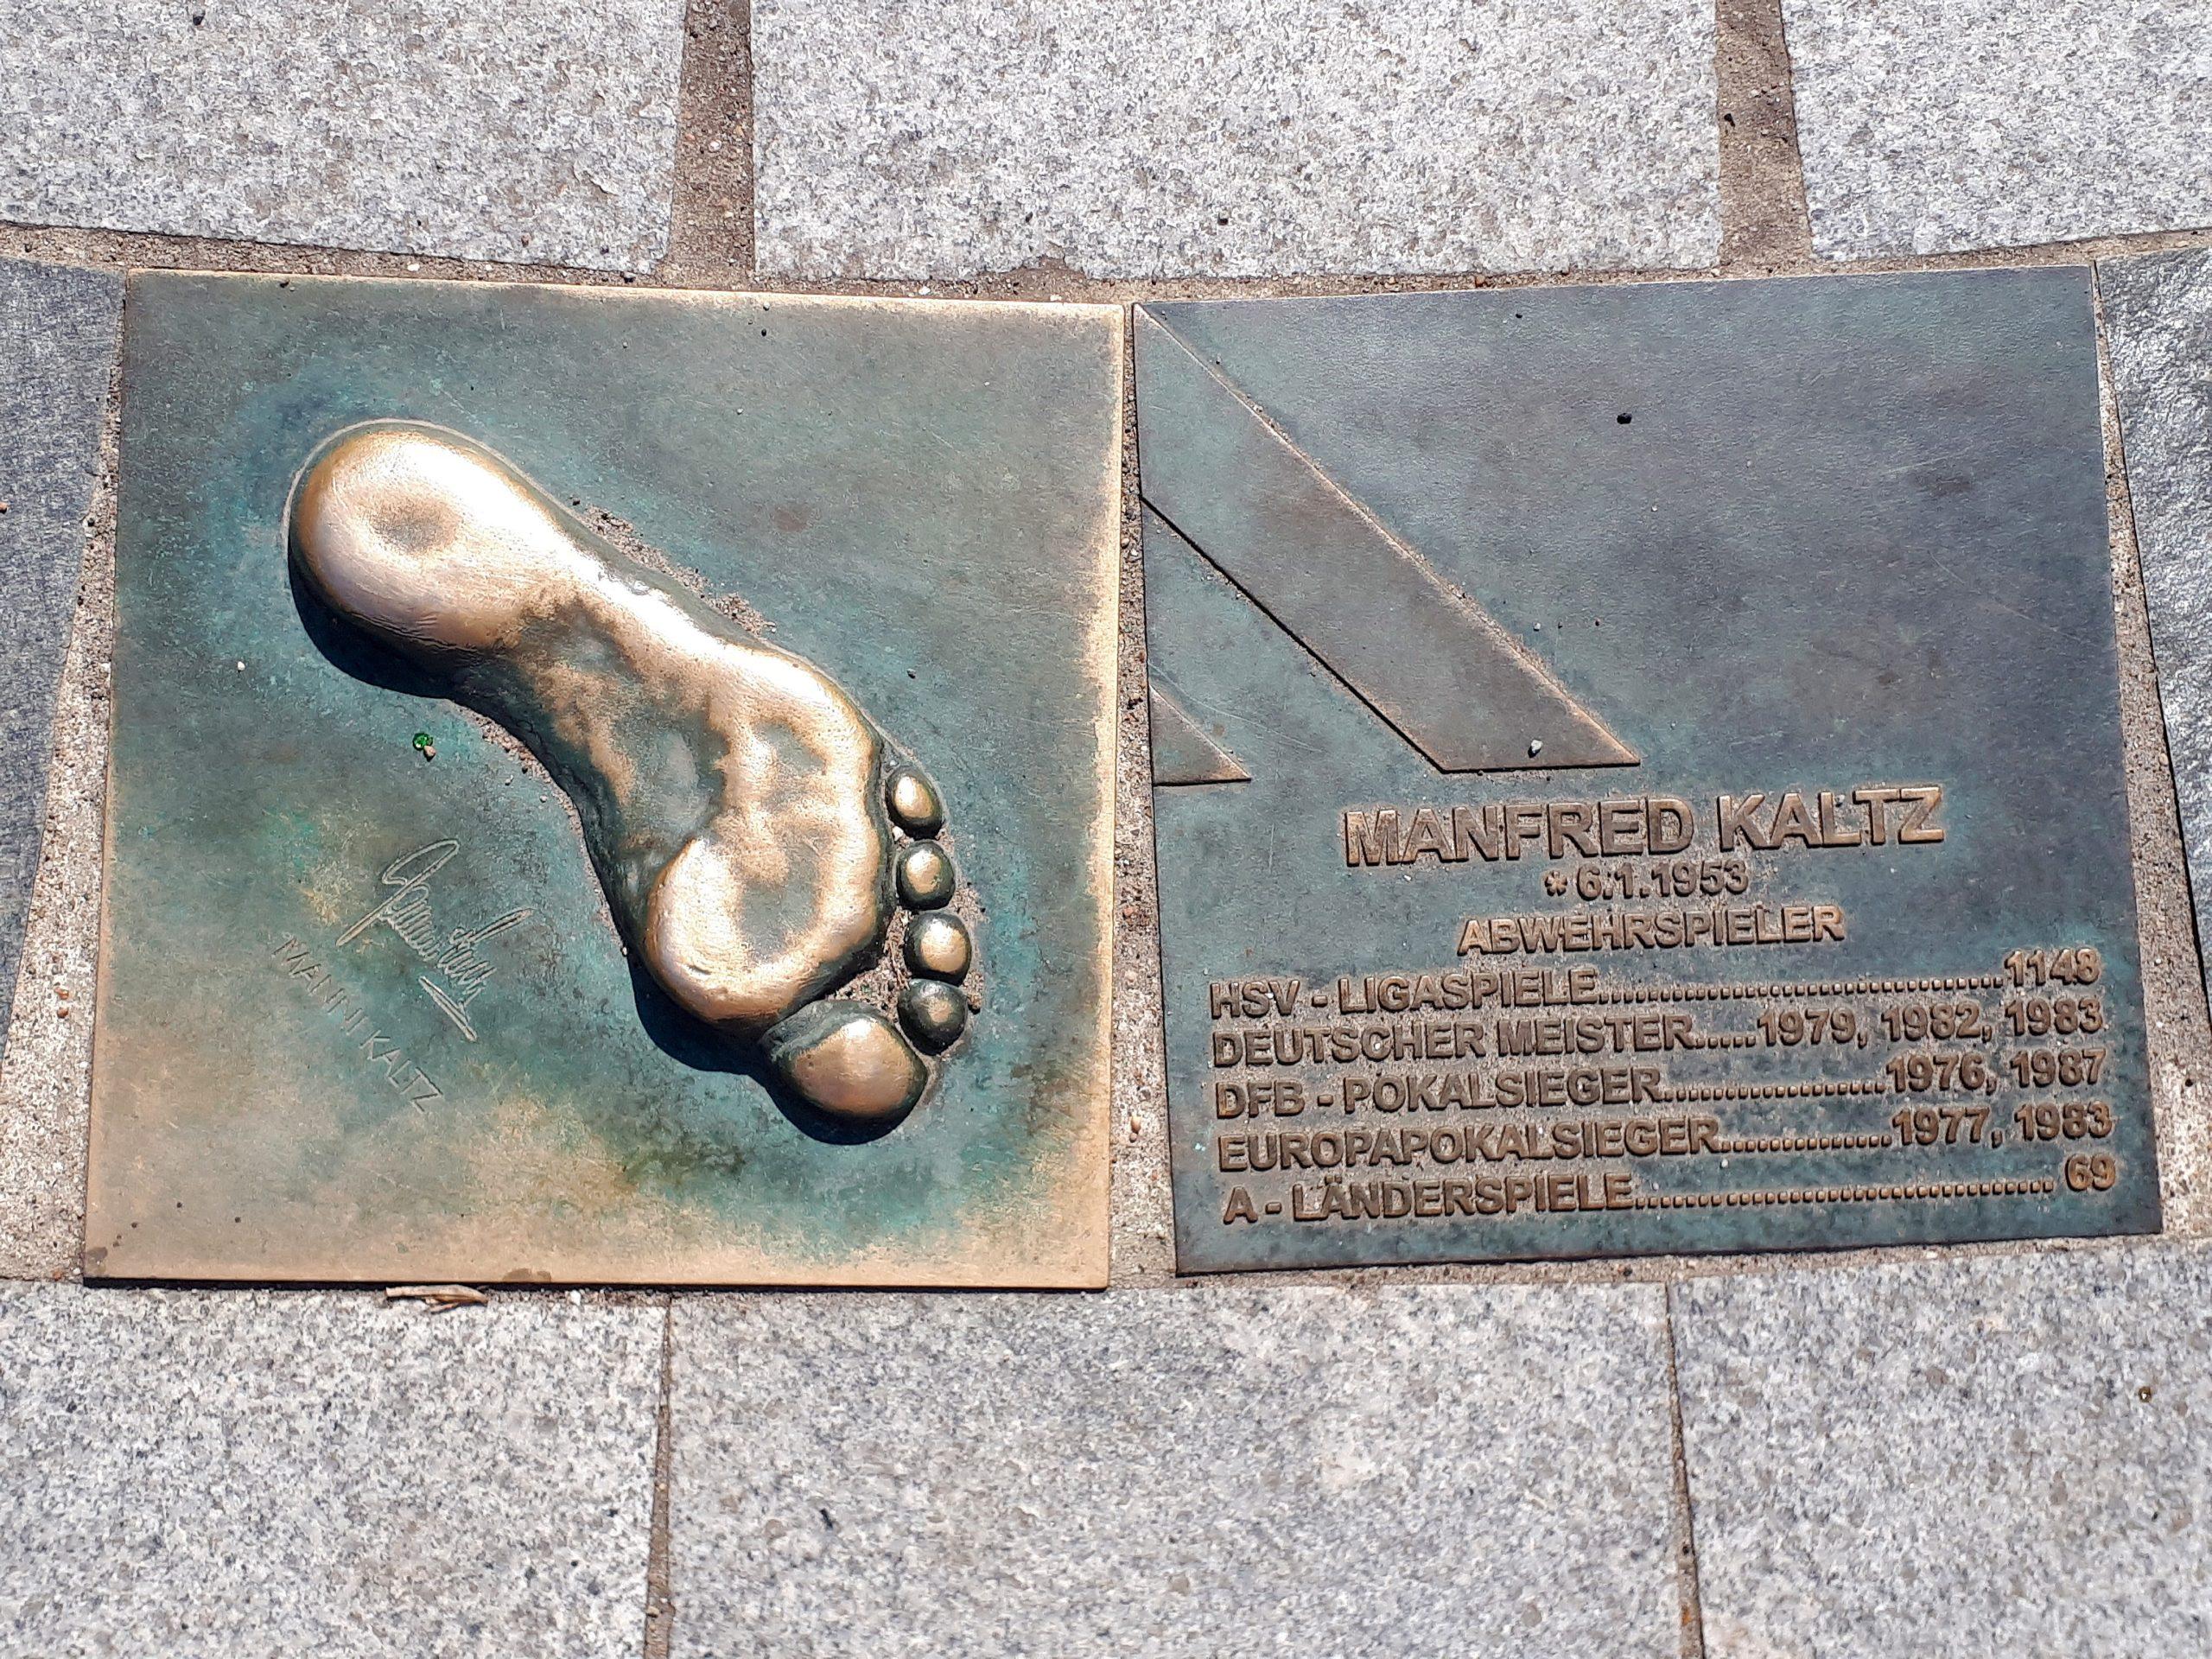 Der Walk of Fame des HSV: Manfred Kaltz